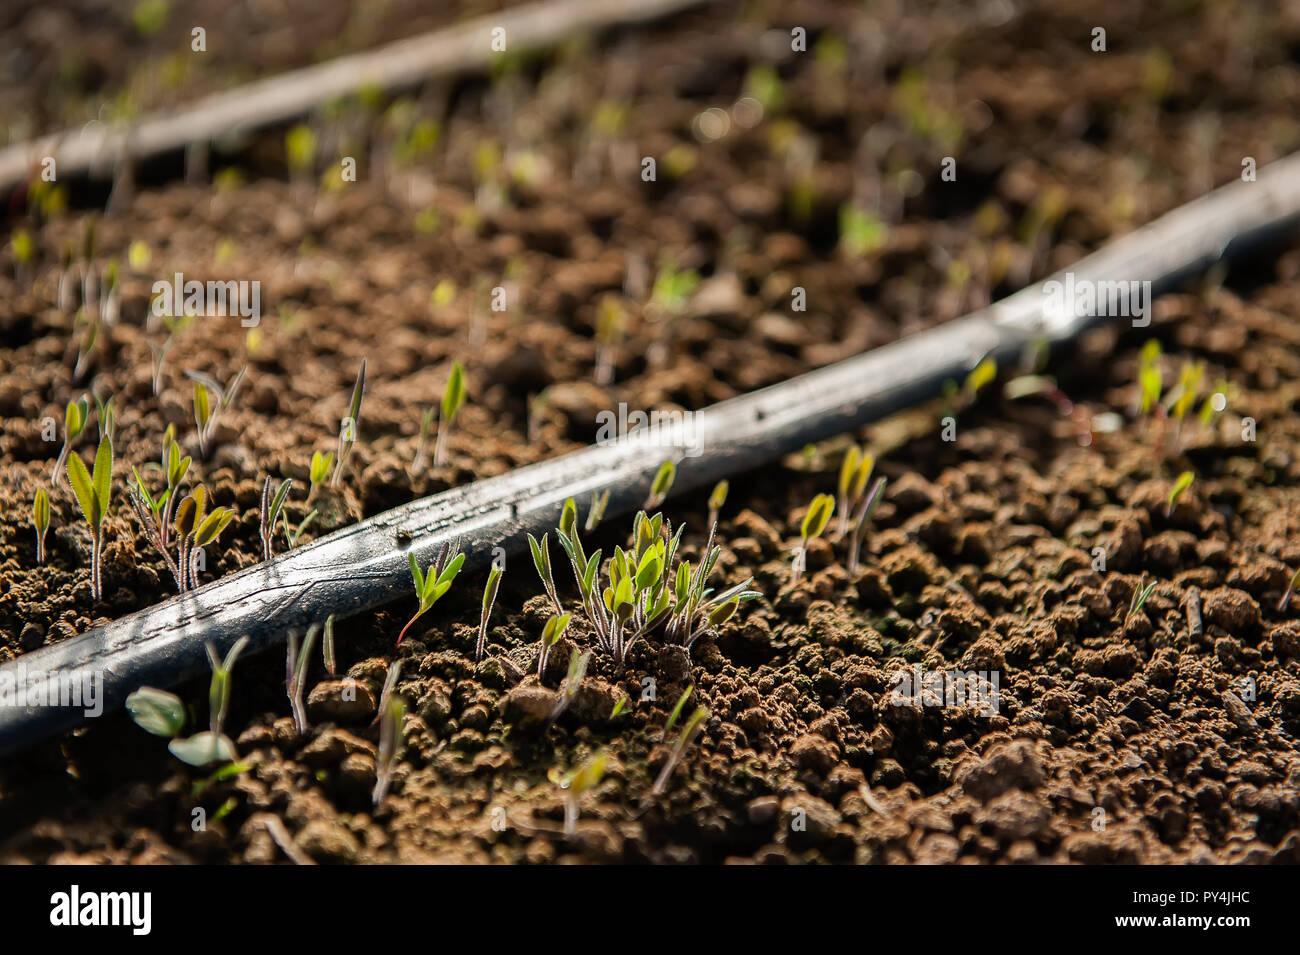 Seedlings emerge from the spring soil. - Stock Image